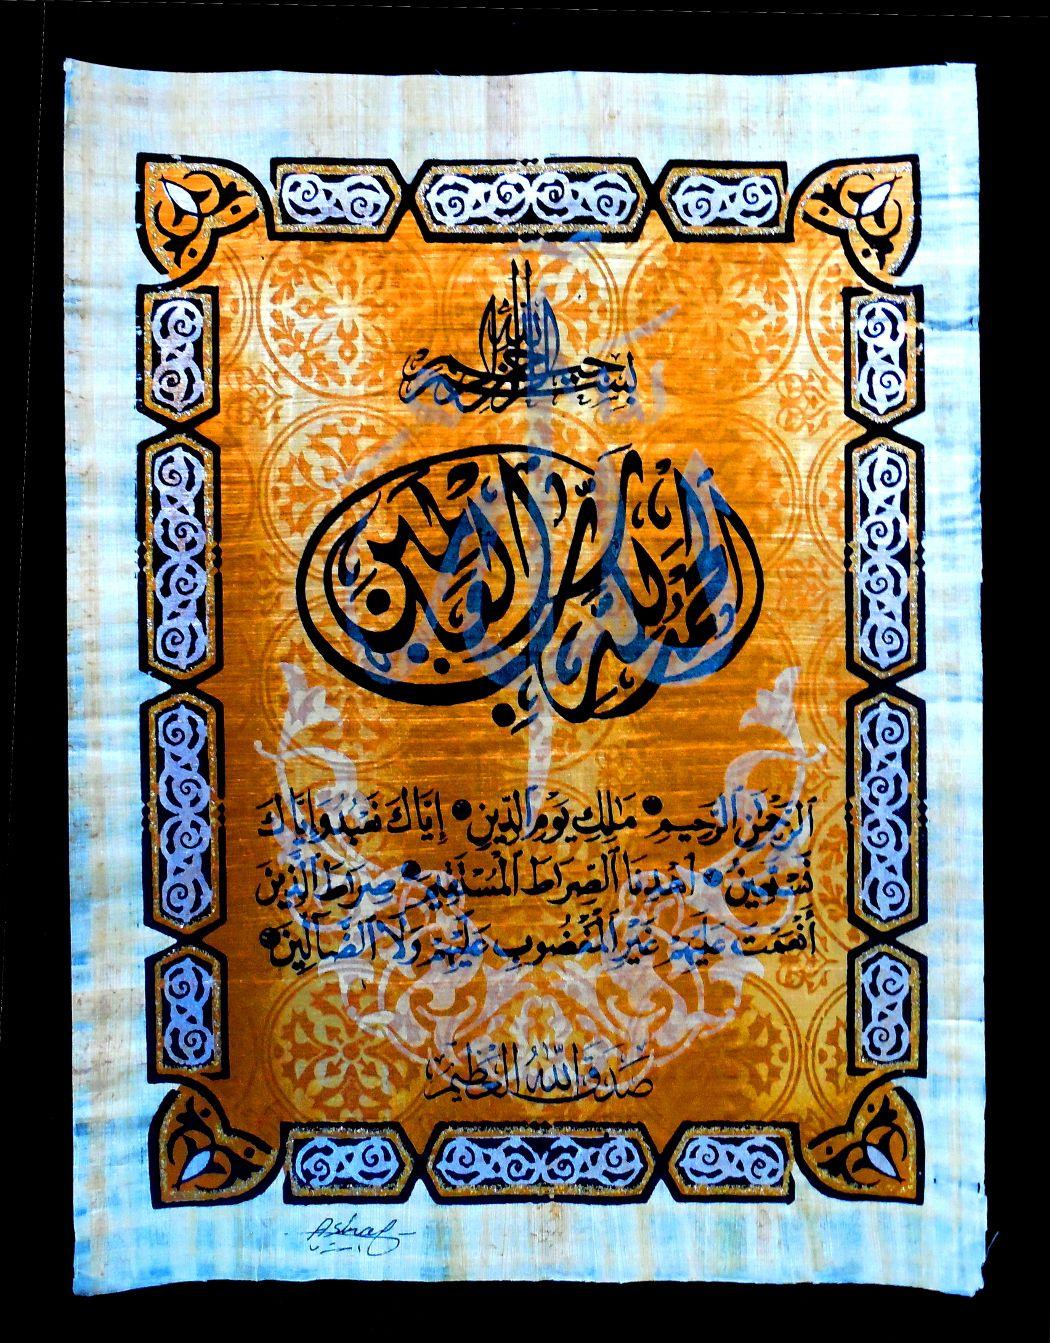 Al Fatihah Islamic Calligraphy Papyrus Painting Arabic